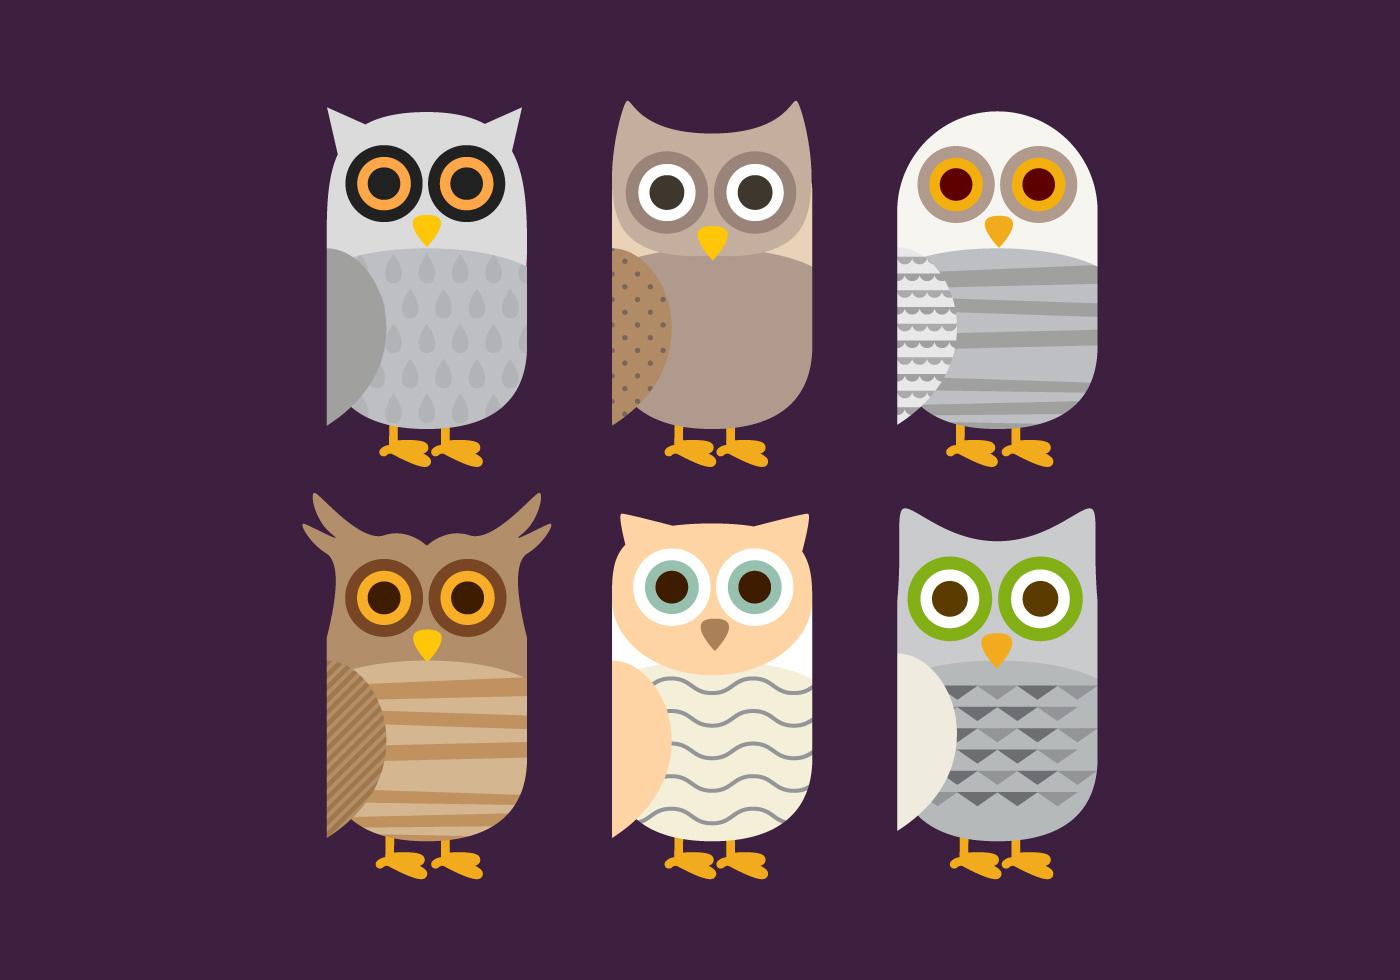 Cute Owl Cartoon Wallpaper Vector Barn Owl Download Free Vector Art Stock Graphics